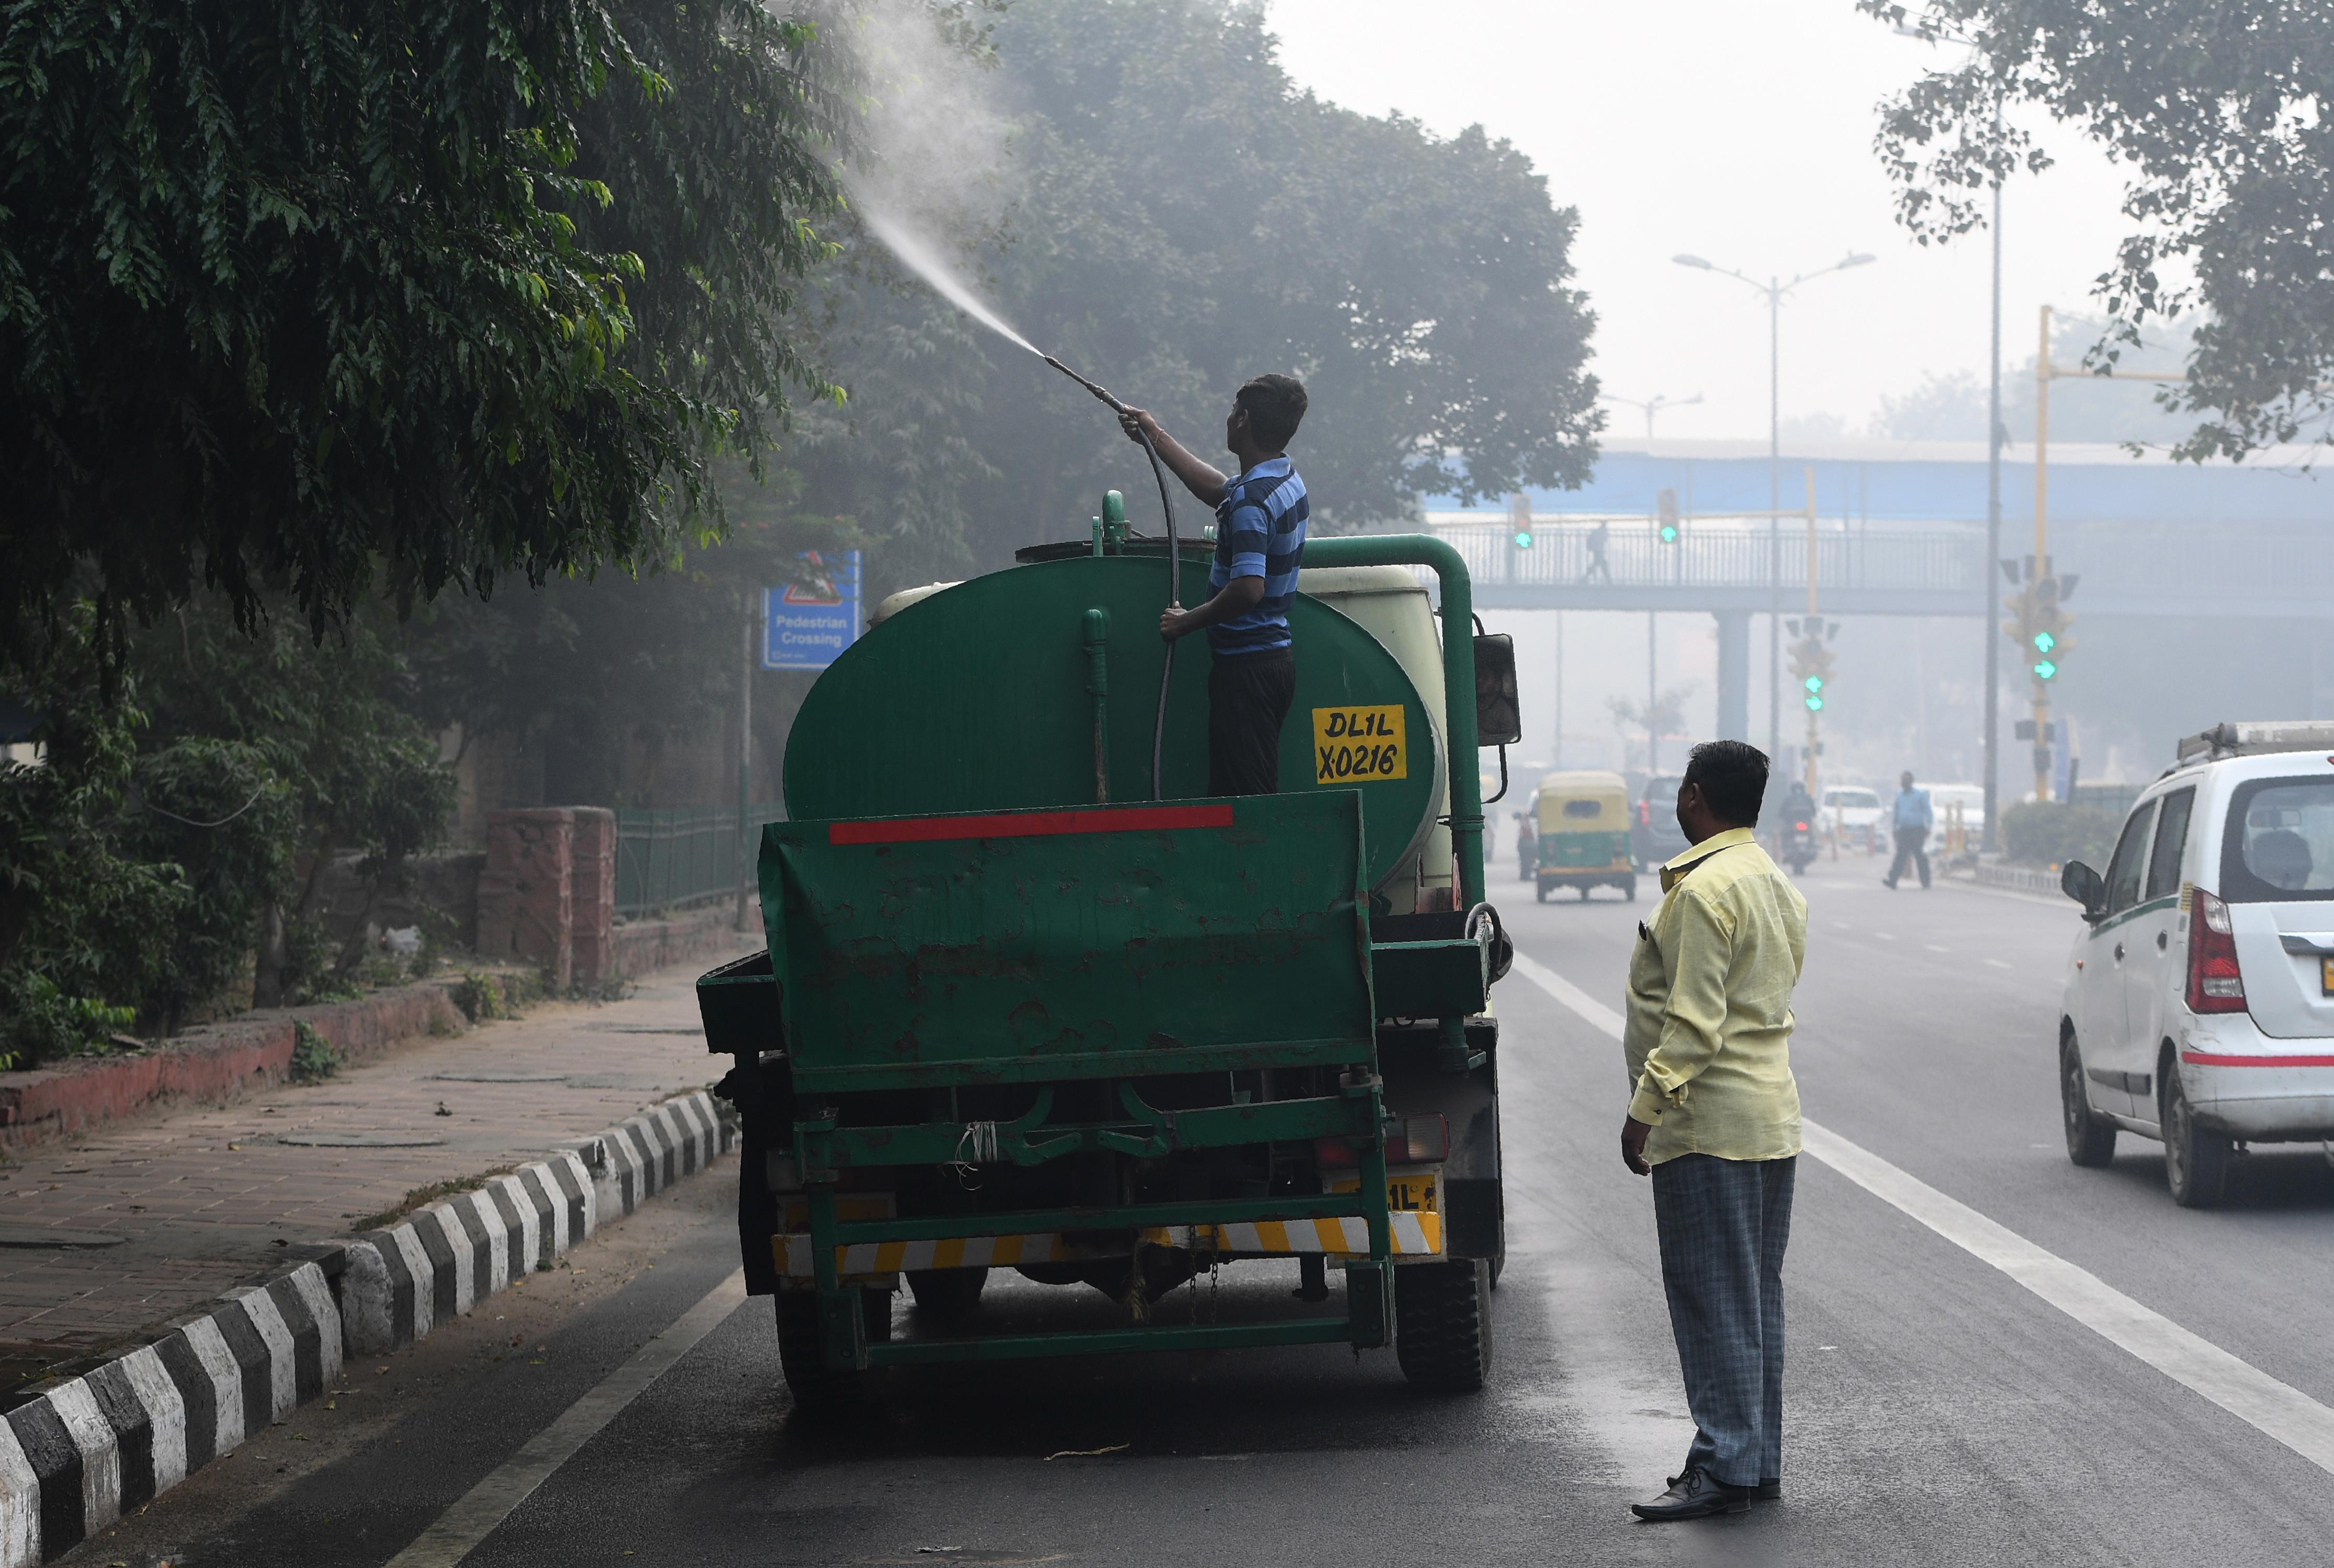 (Photo by Money SHARMA / AFP)